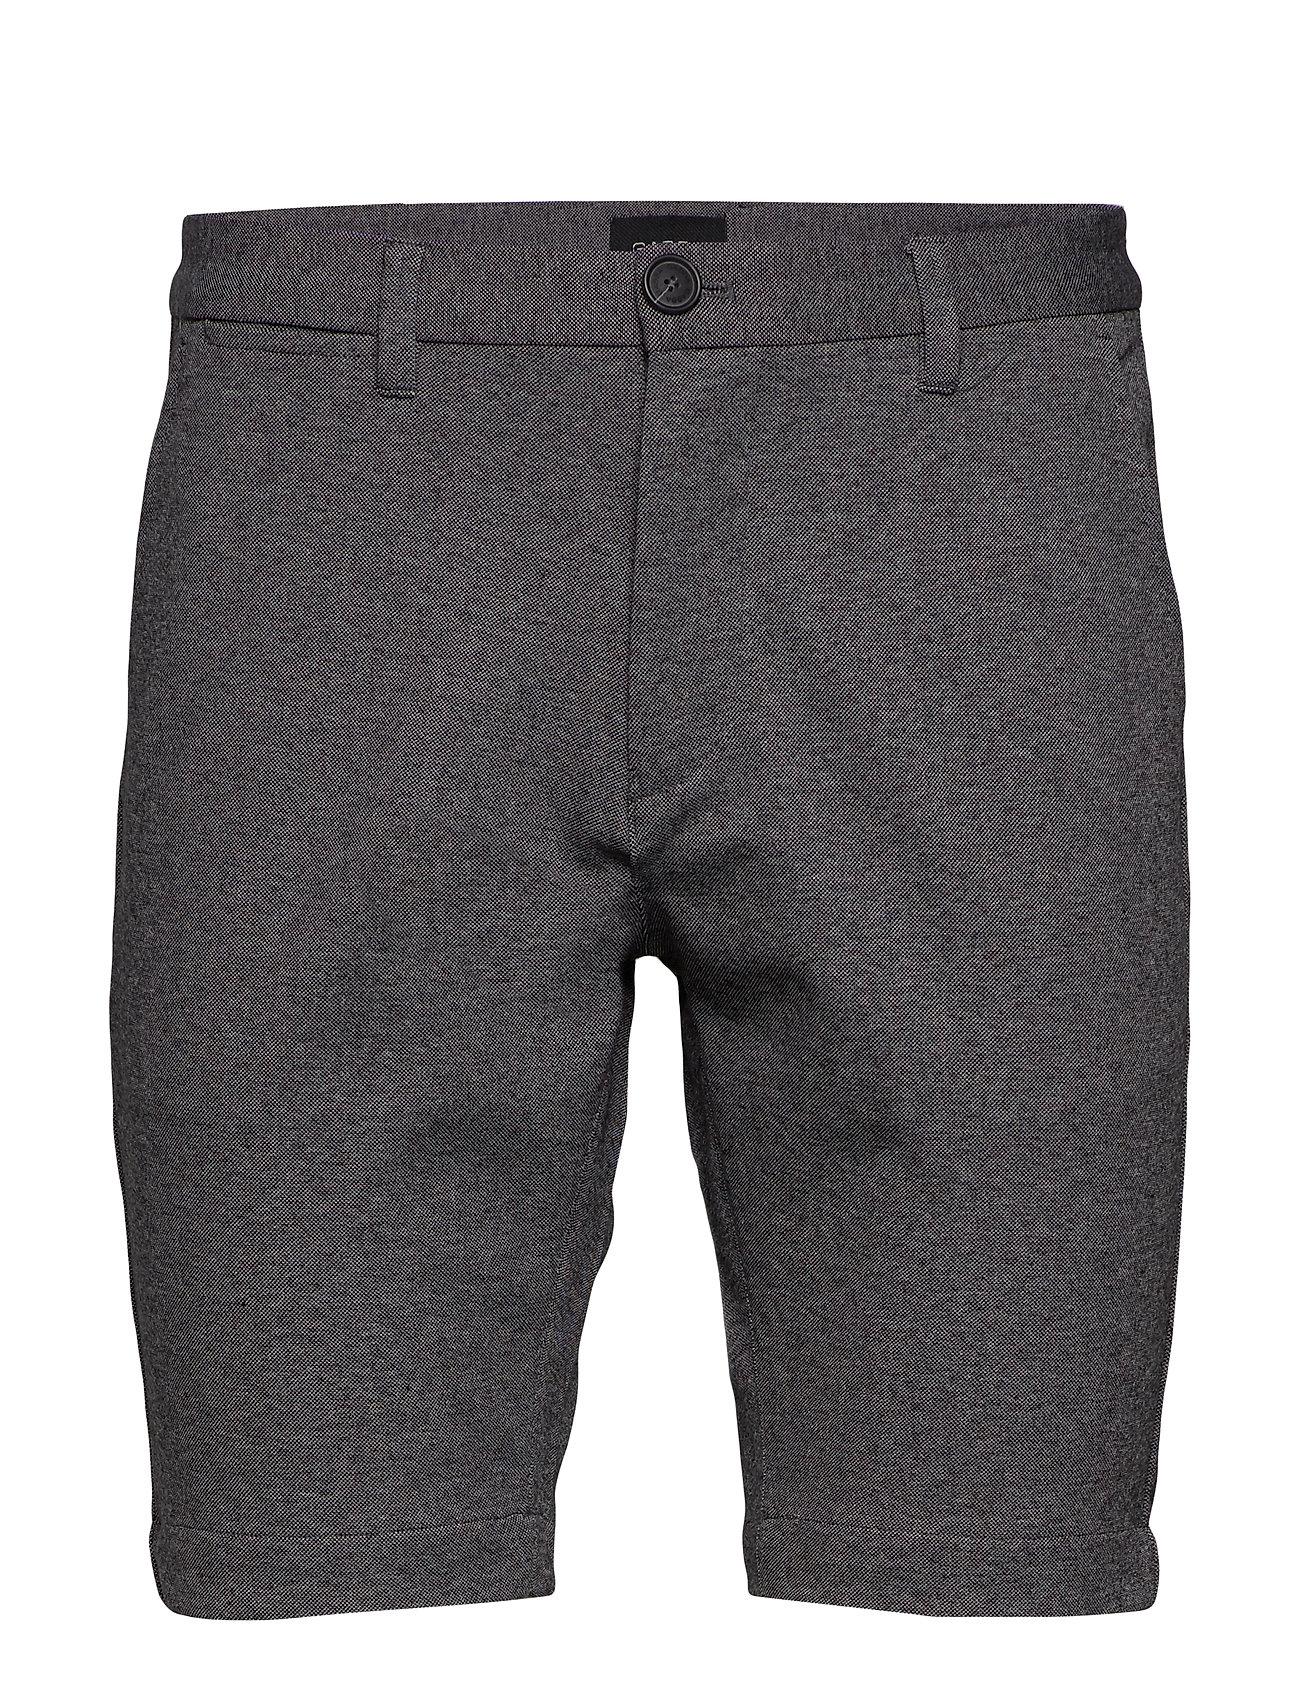 Image of Jason Chino Jersey Shorts Shorts Casual Grå Gabba (3562603837)